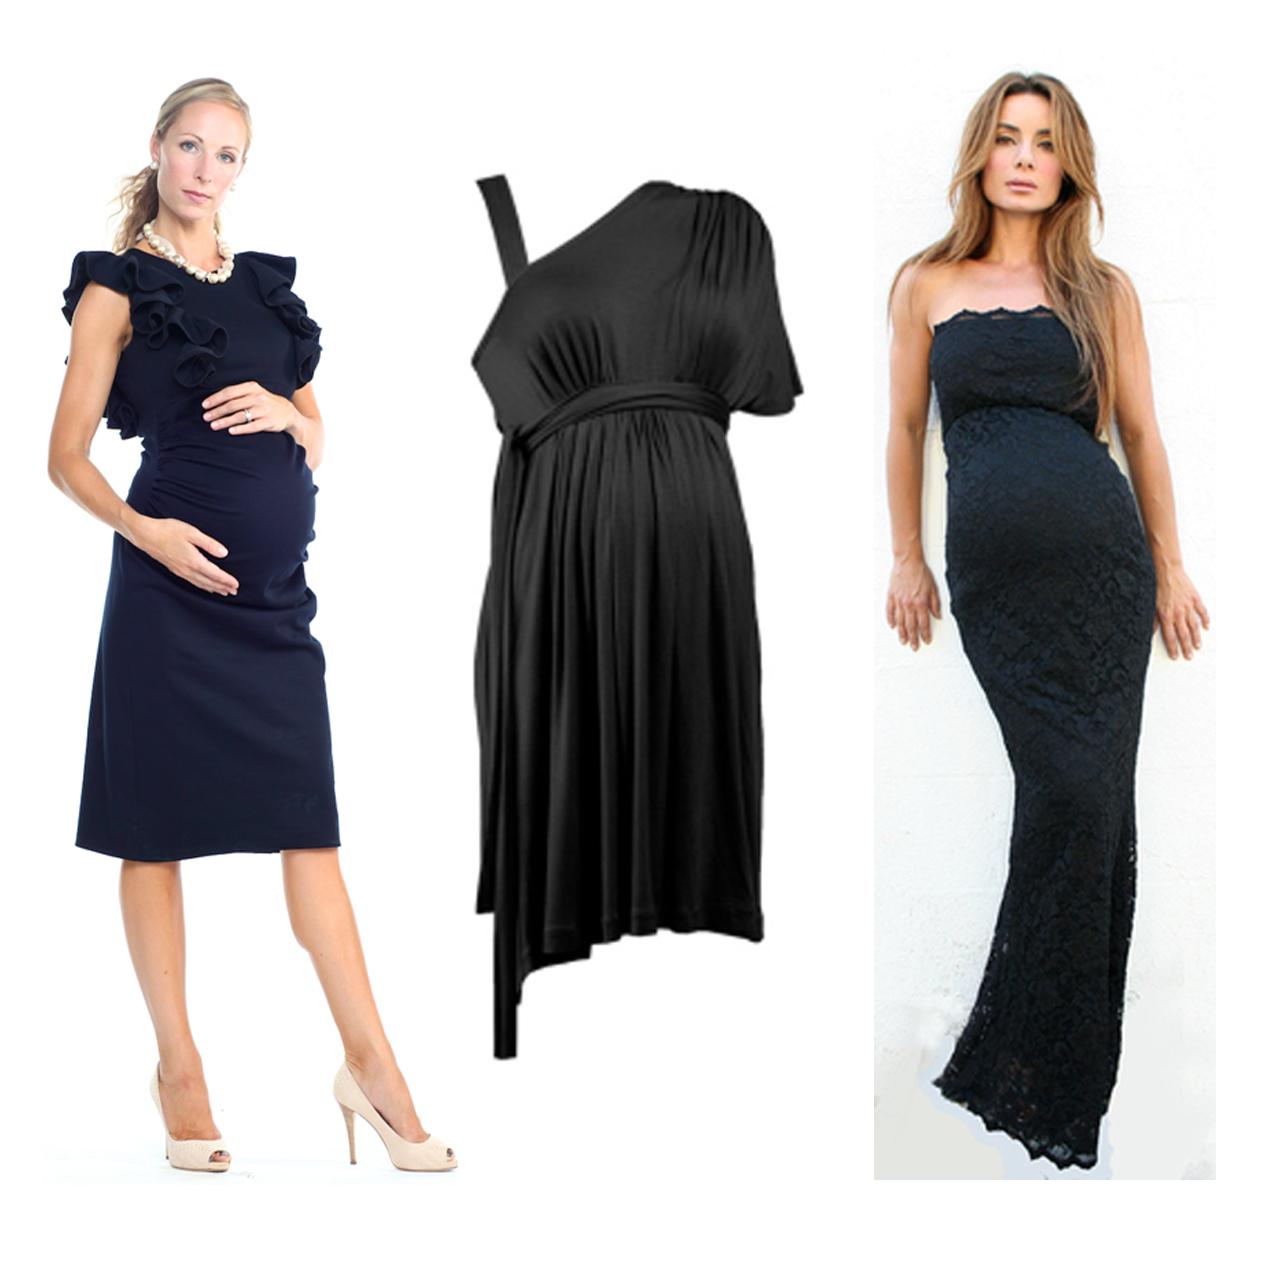 Maternity little black dress three little black dresses ombrellifo Images